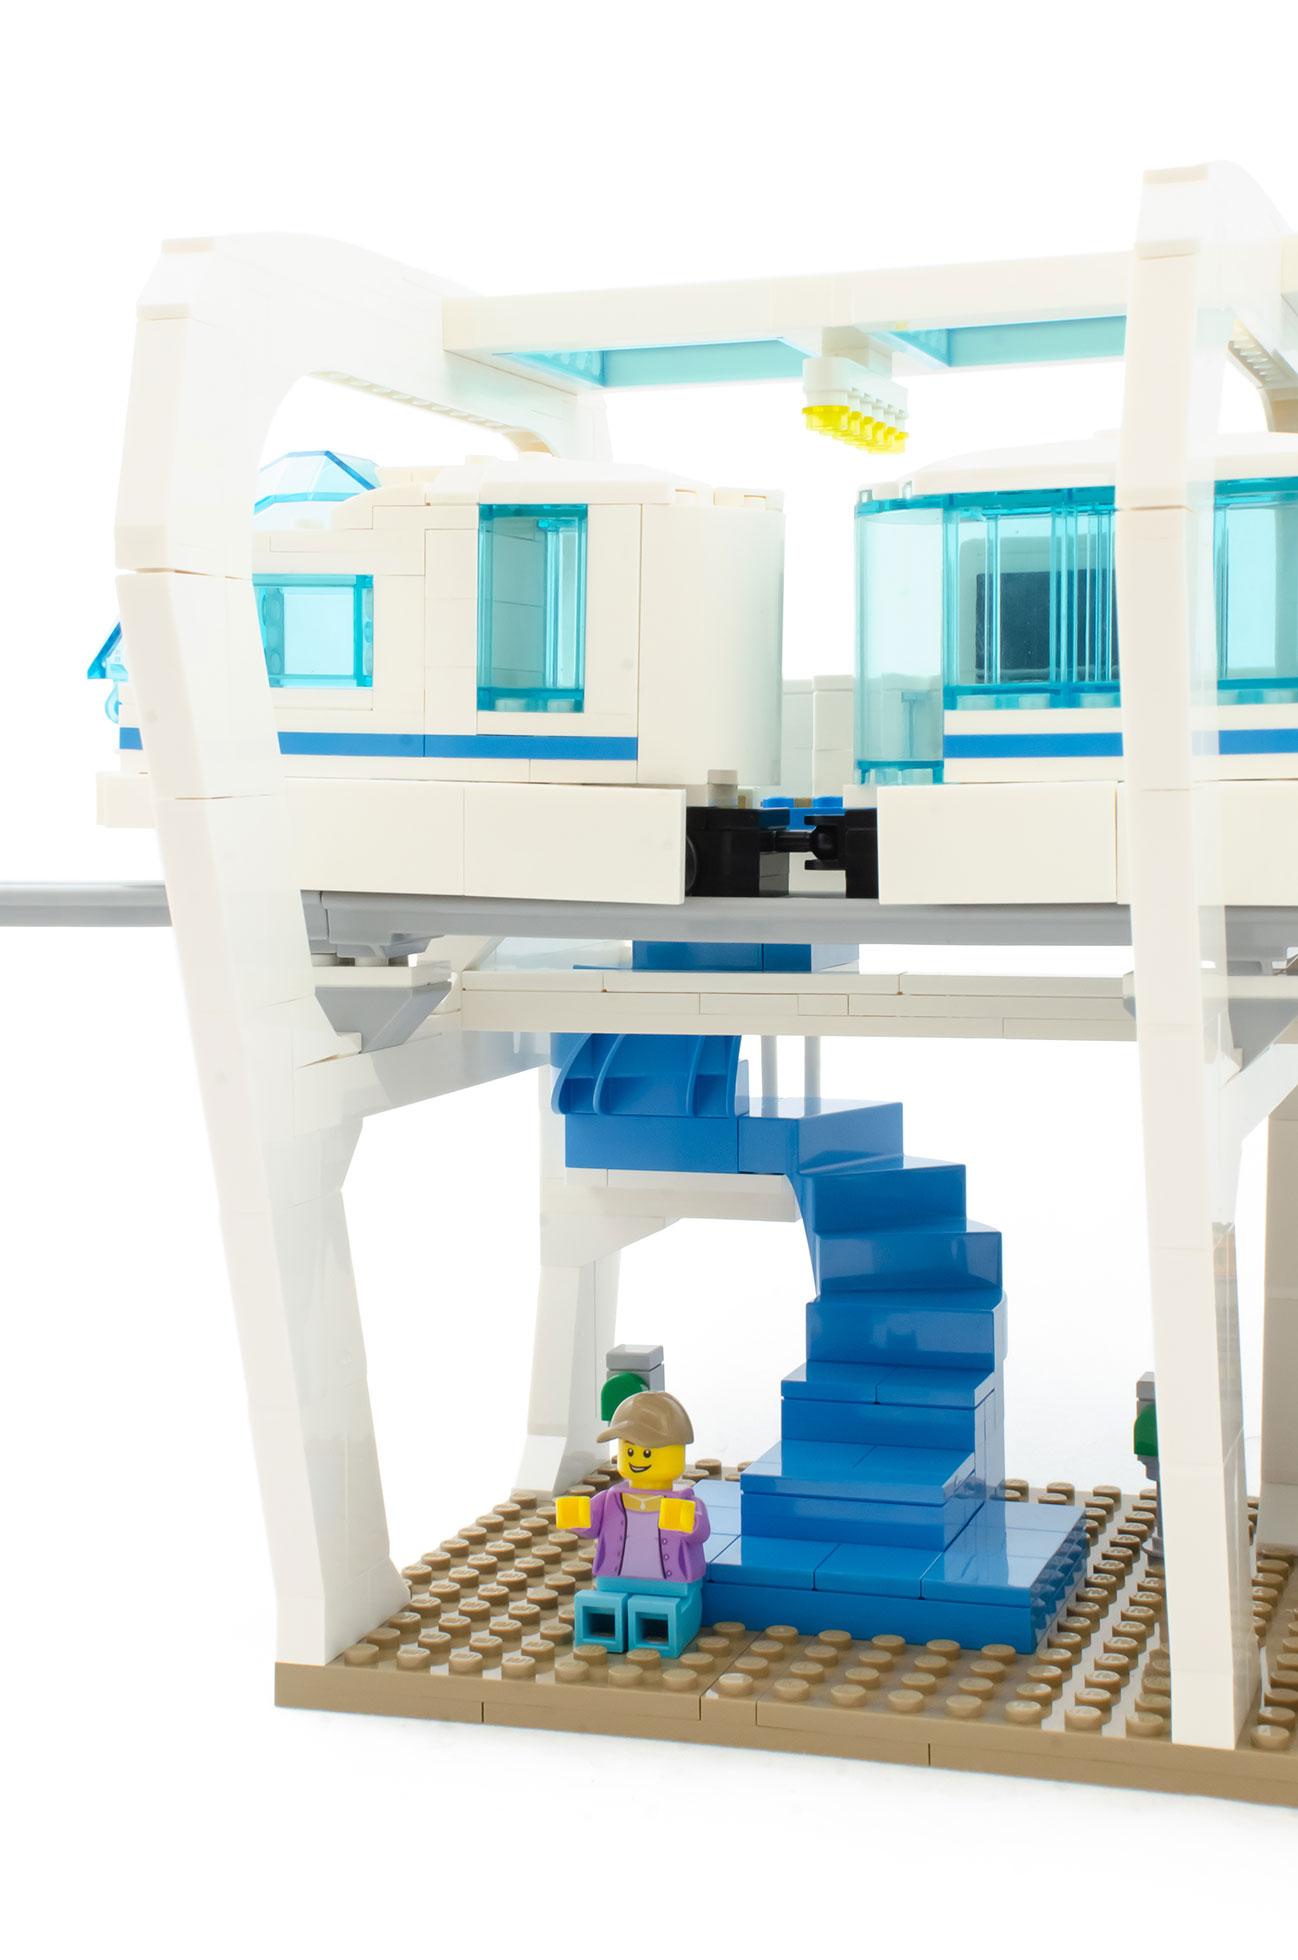 Skyline Express] A sleek monorail train set designed for Adult Fans